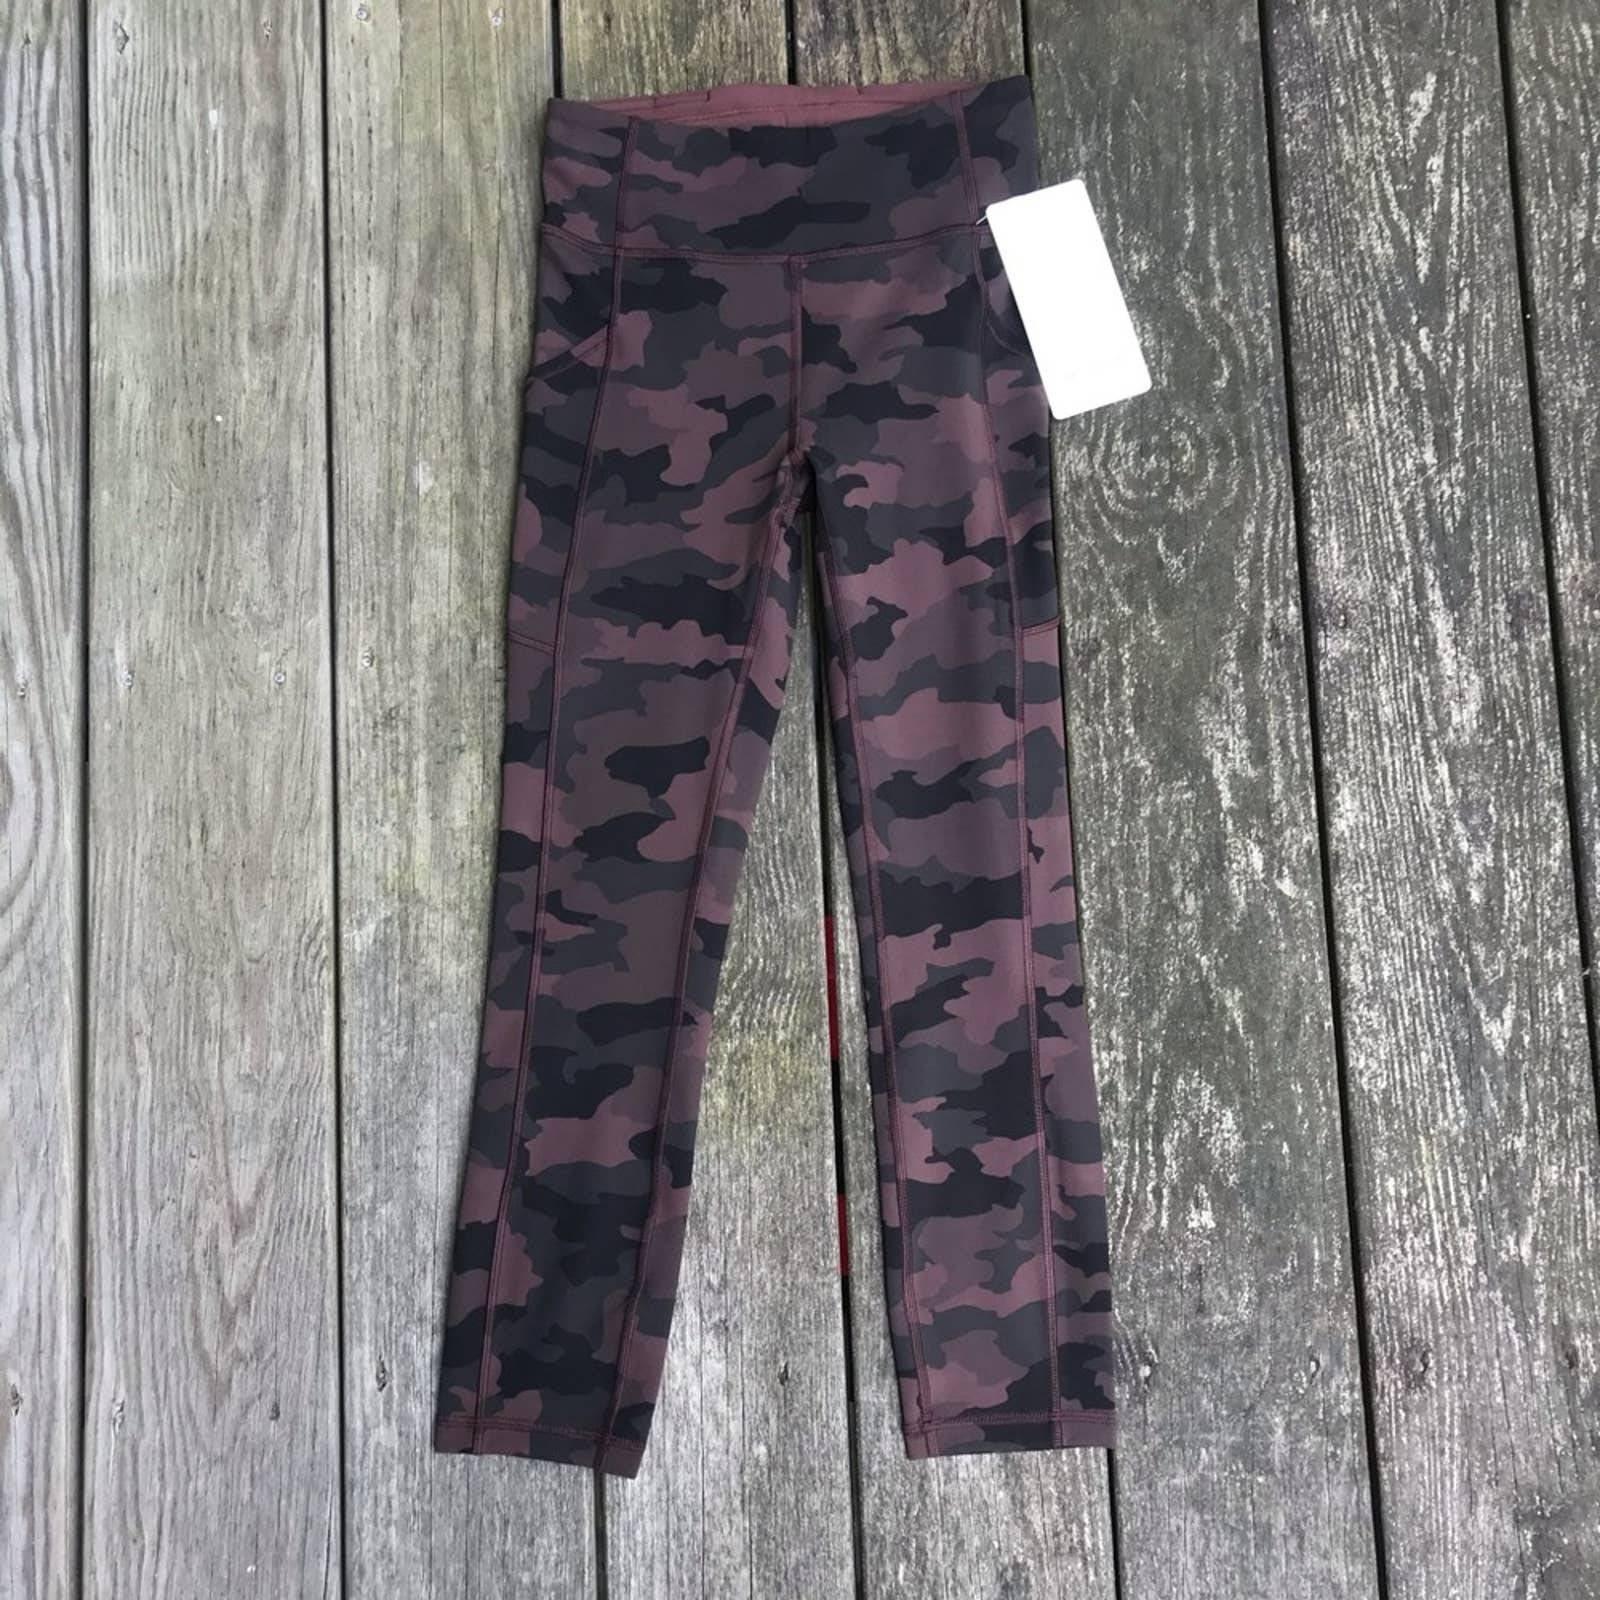 NWT Lululemon Invigorate Cammo leggings